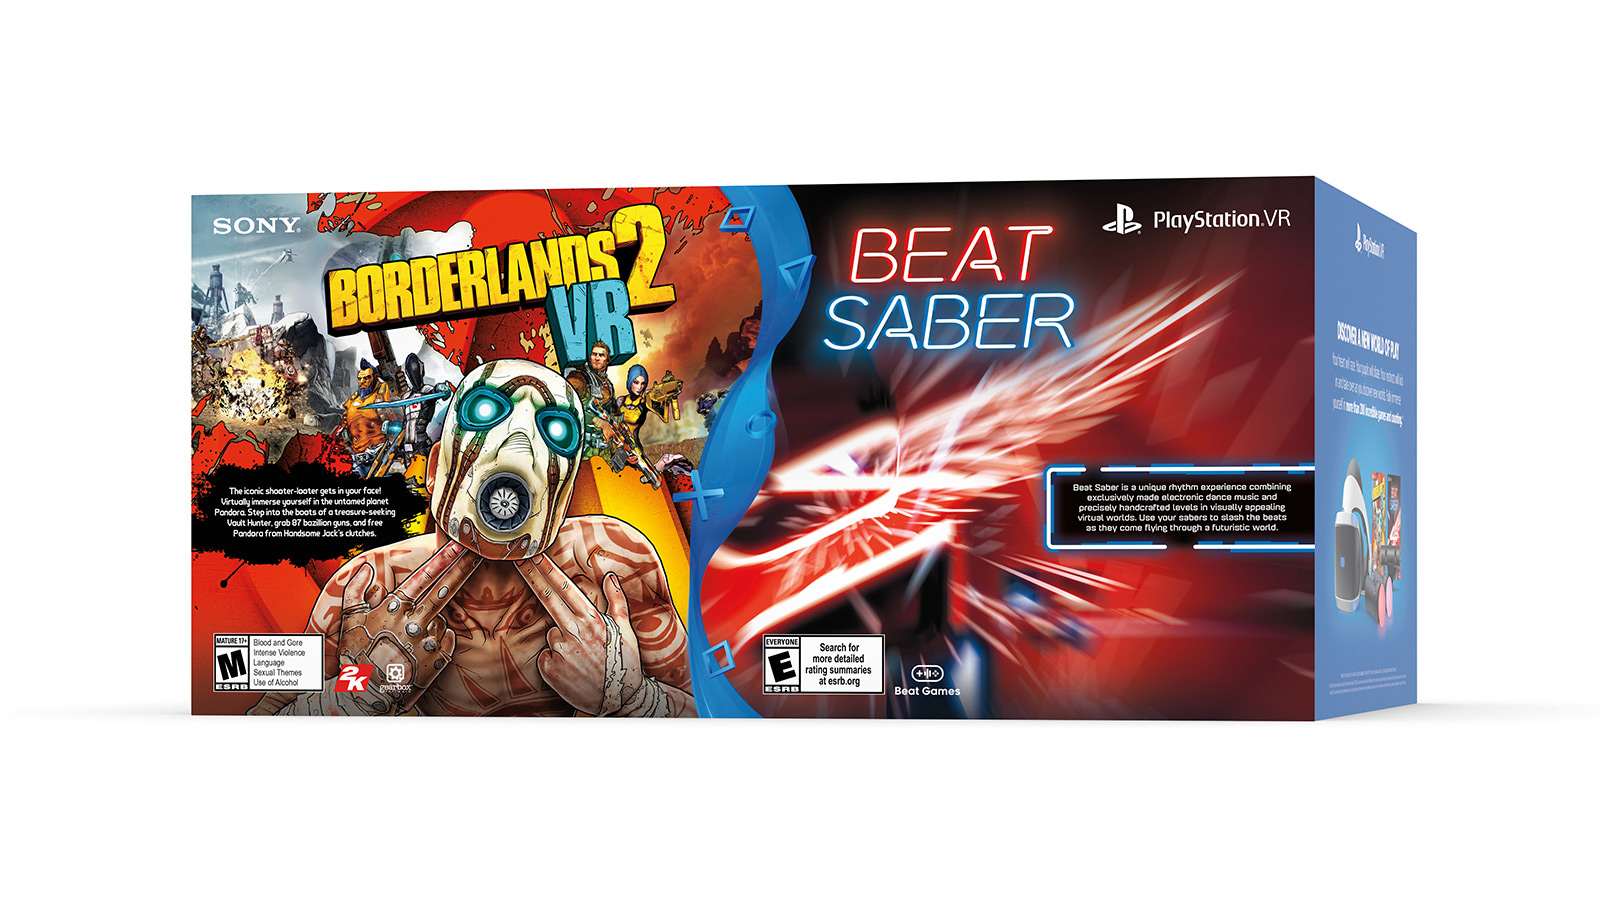 Upcoming PlayStation VR bundle packs in Borderlands 2 and Beat Saber screenshot